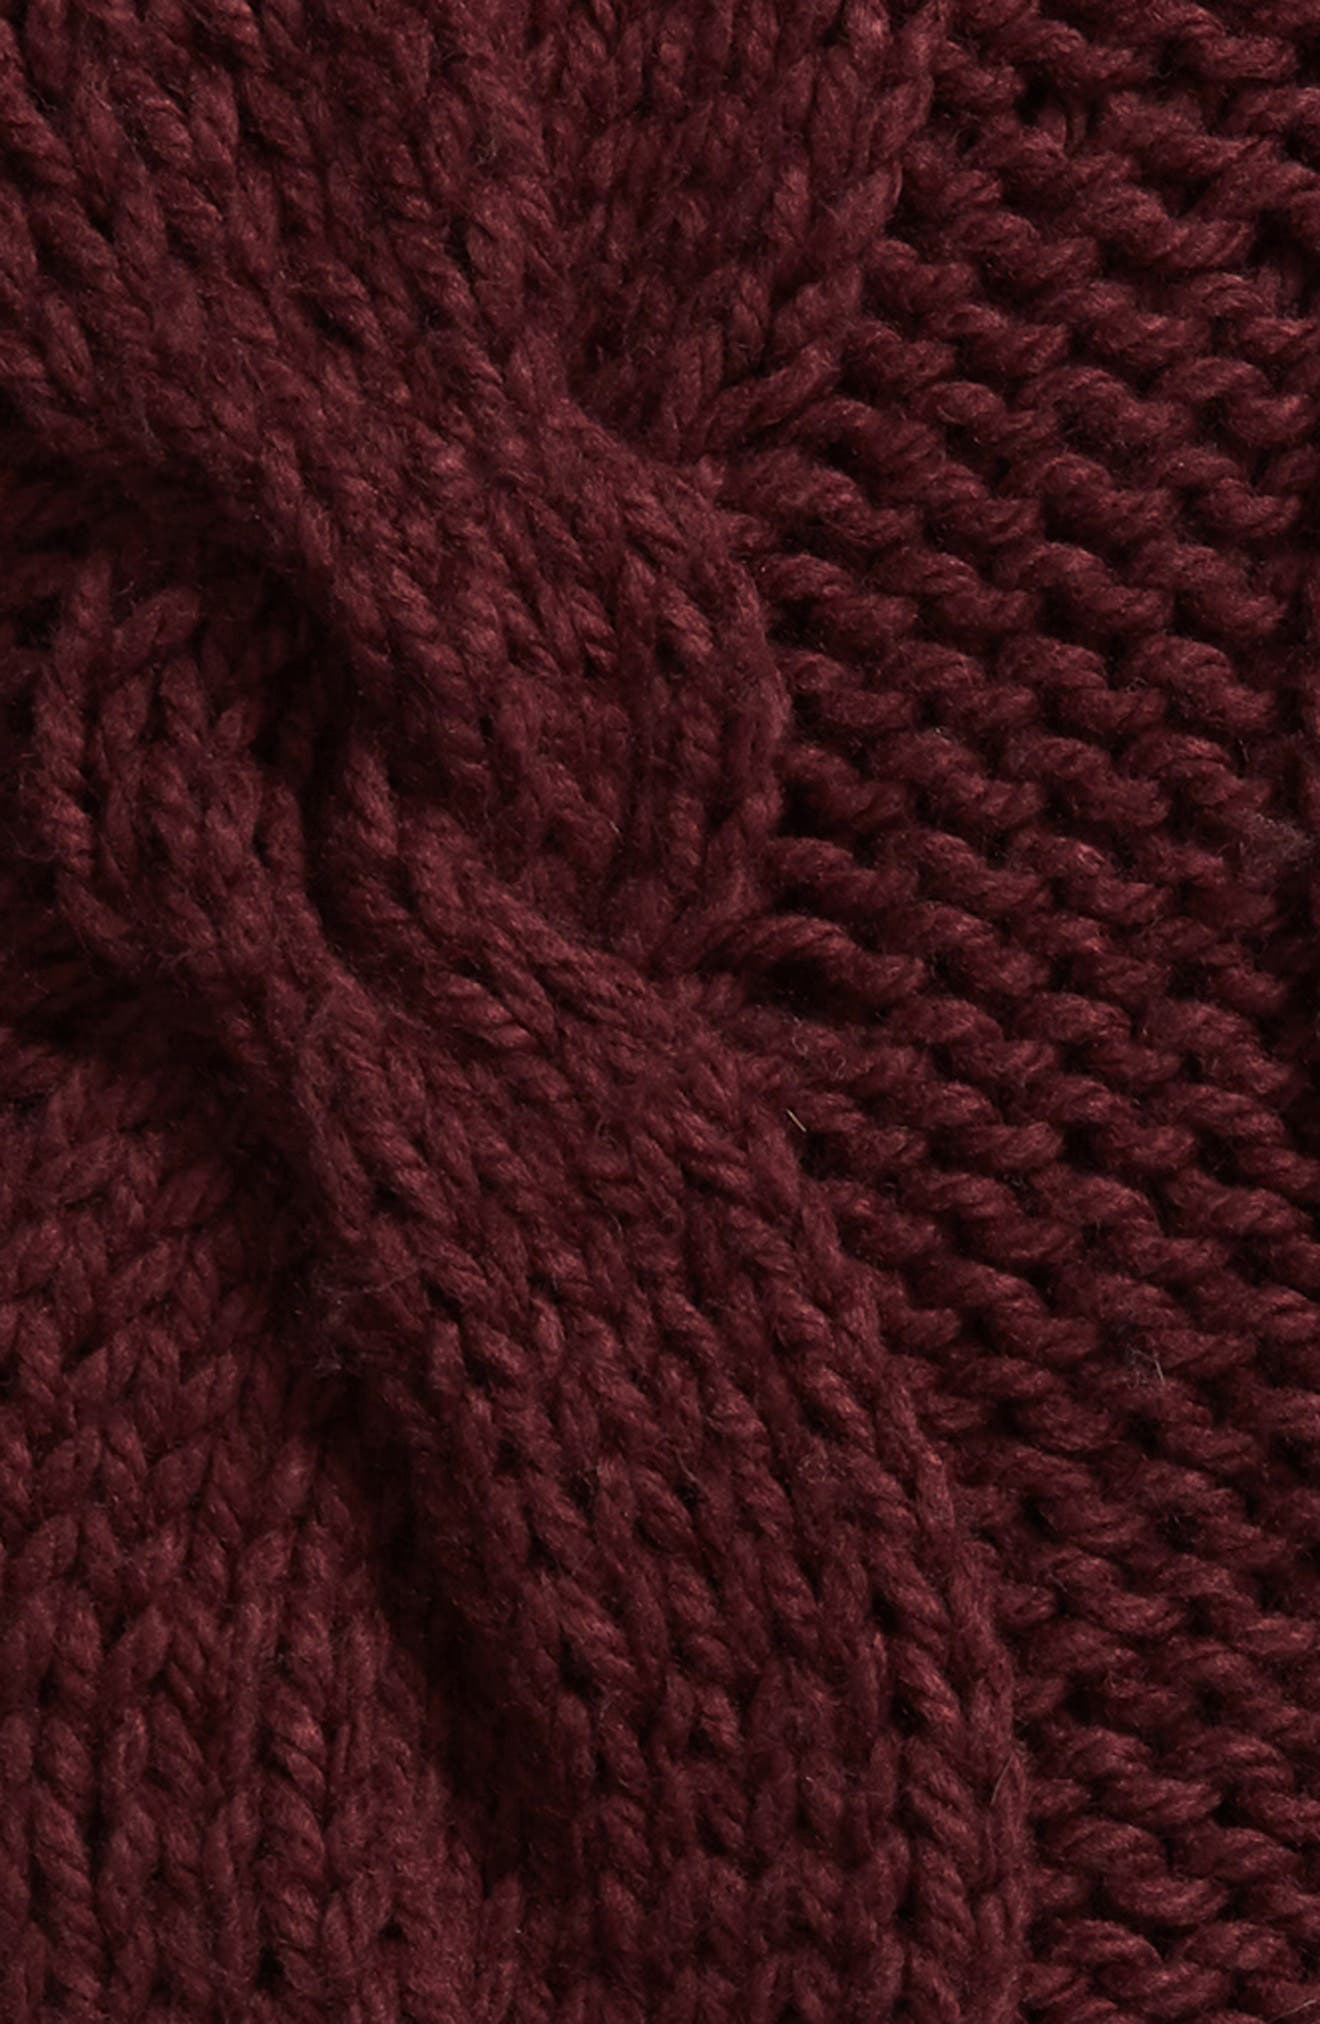 Cable Knit Tassel Throw Blanket,                             Alternate thumbnail 2, color,                             BURGUNDY STEM